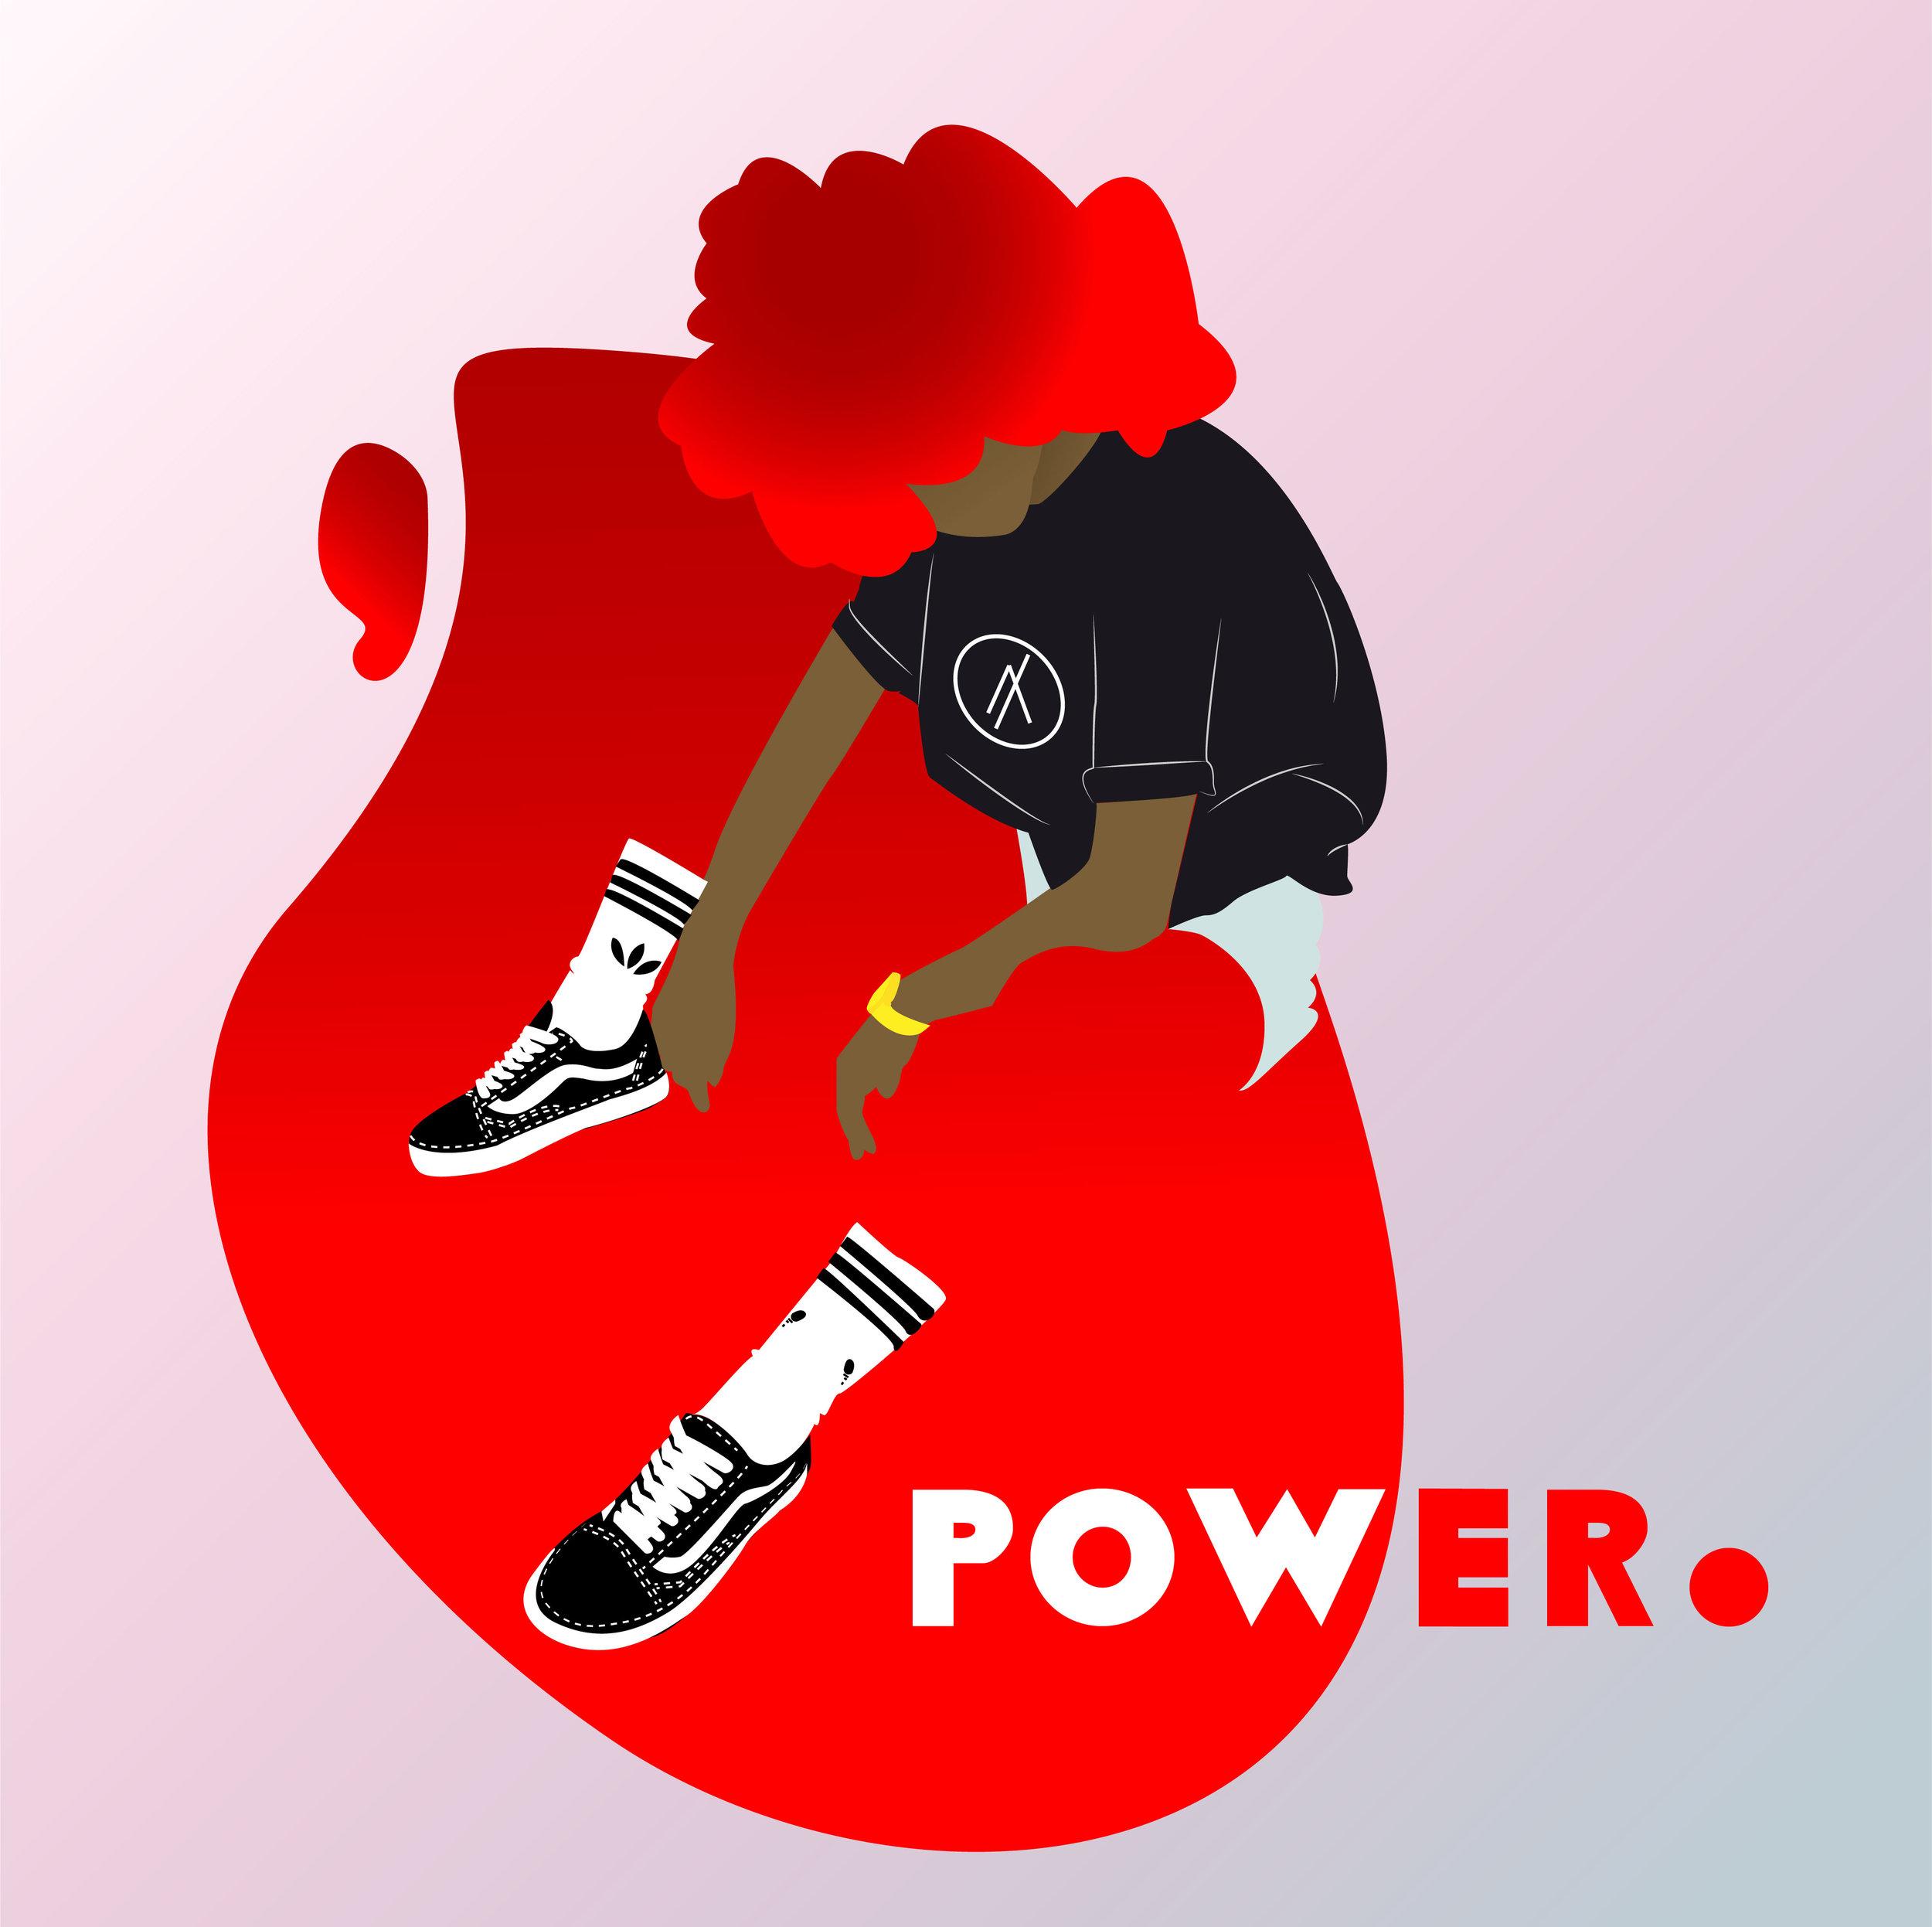 power-08.jpg